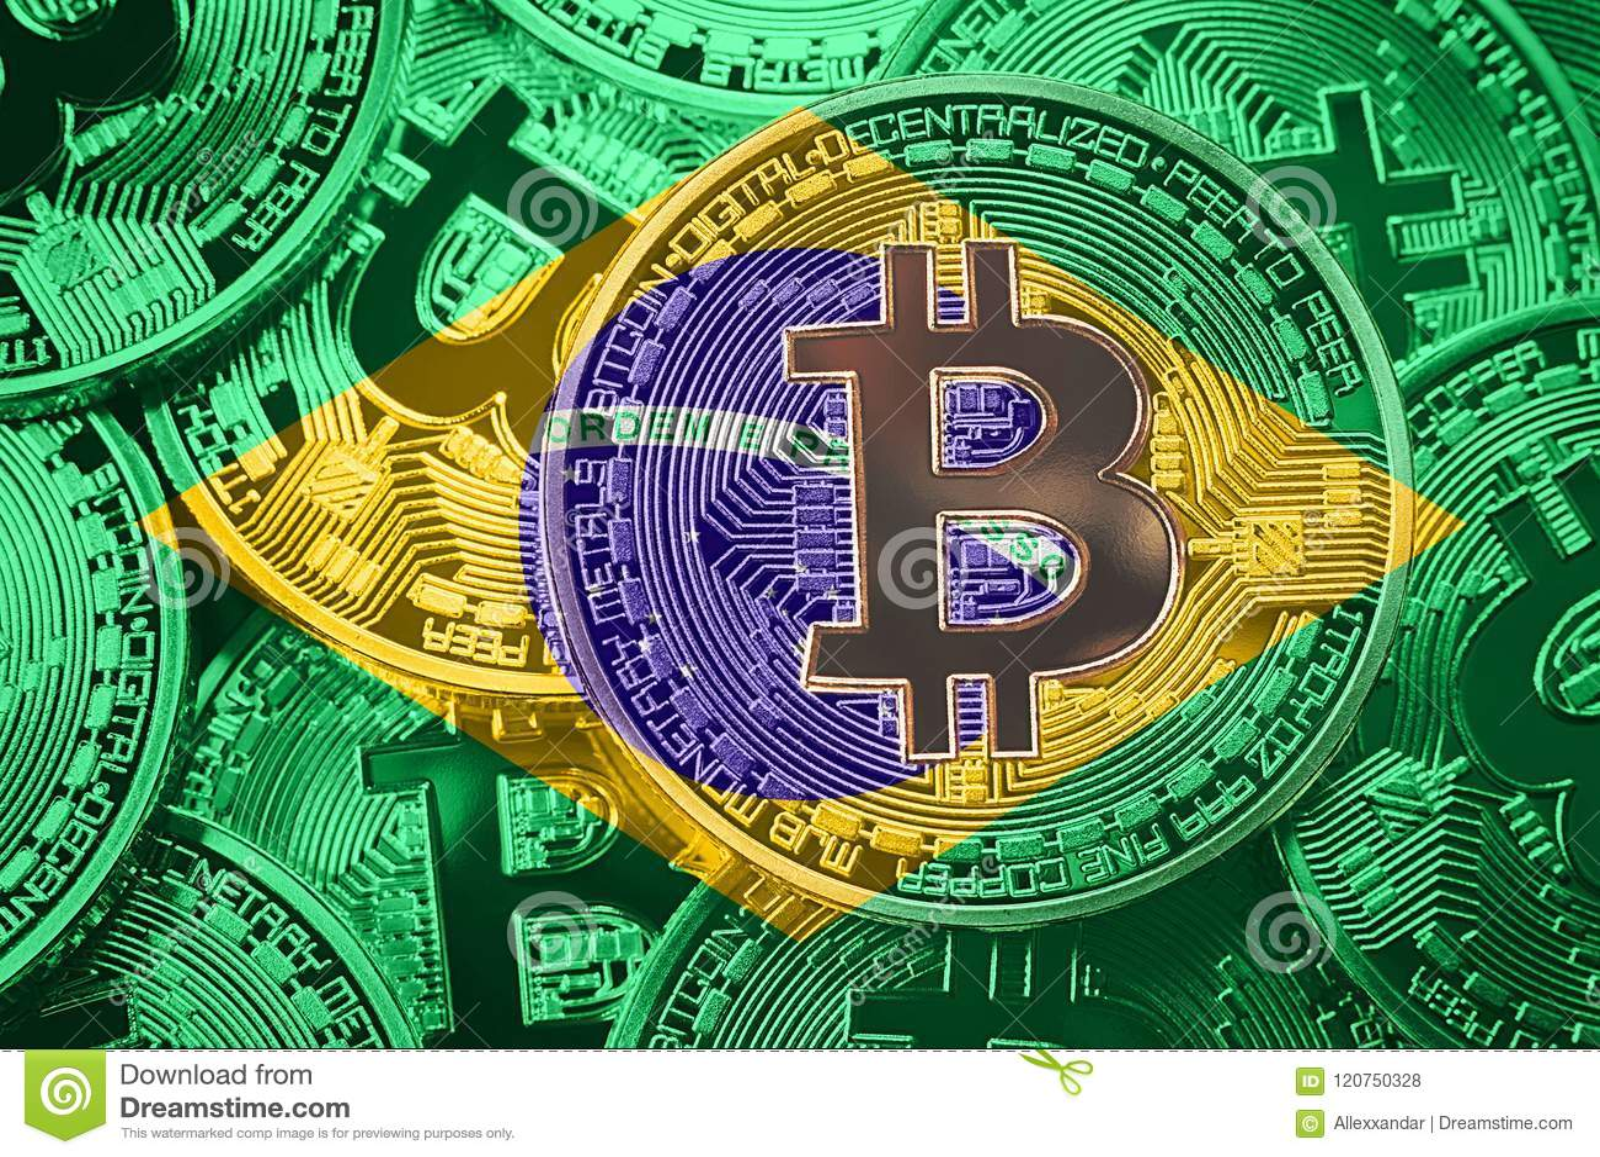 Twitter accetterà bitcoin per la funzione 'Tip Jar' - Hi-tech - ANSA